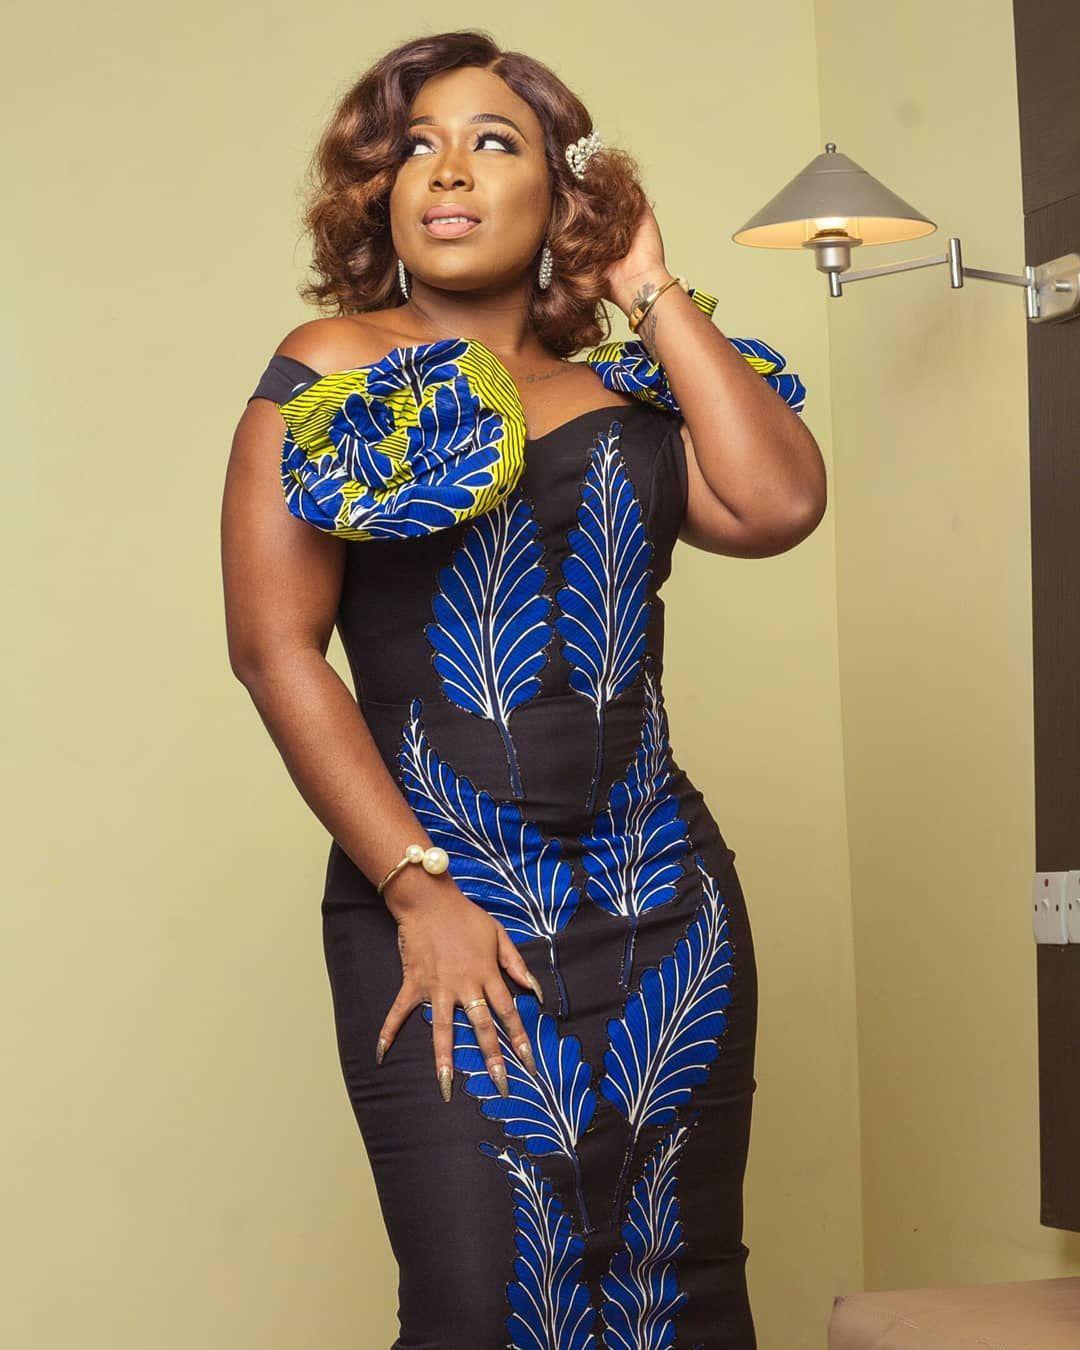 Lagos Best Fashion Designer On Instagram Oobiuku Moet Abebe The Radio Goddess Ever Stunning Moetabebe For Vlmagafrica Dre In 2020 Fashion Design Fashion Dresses